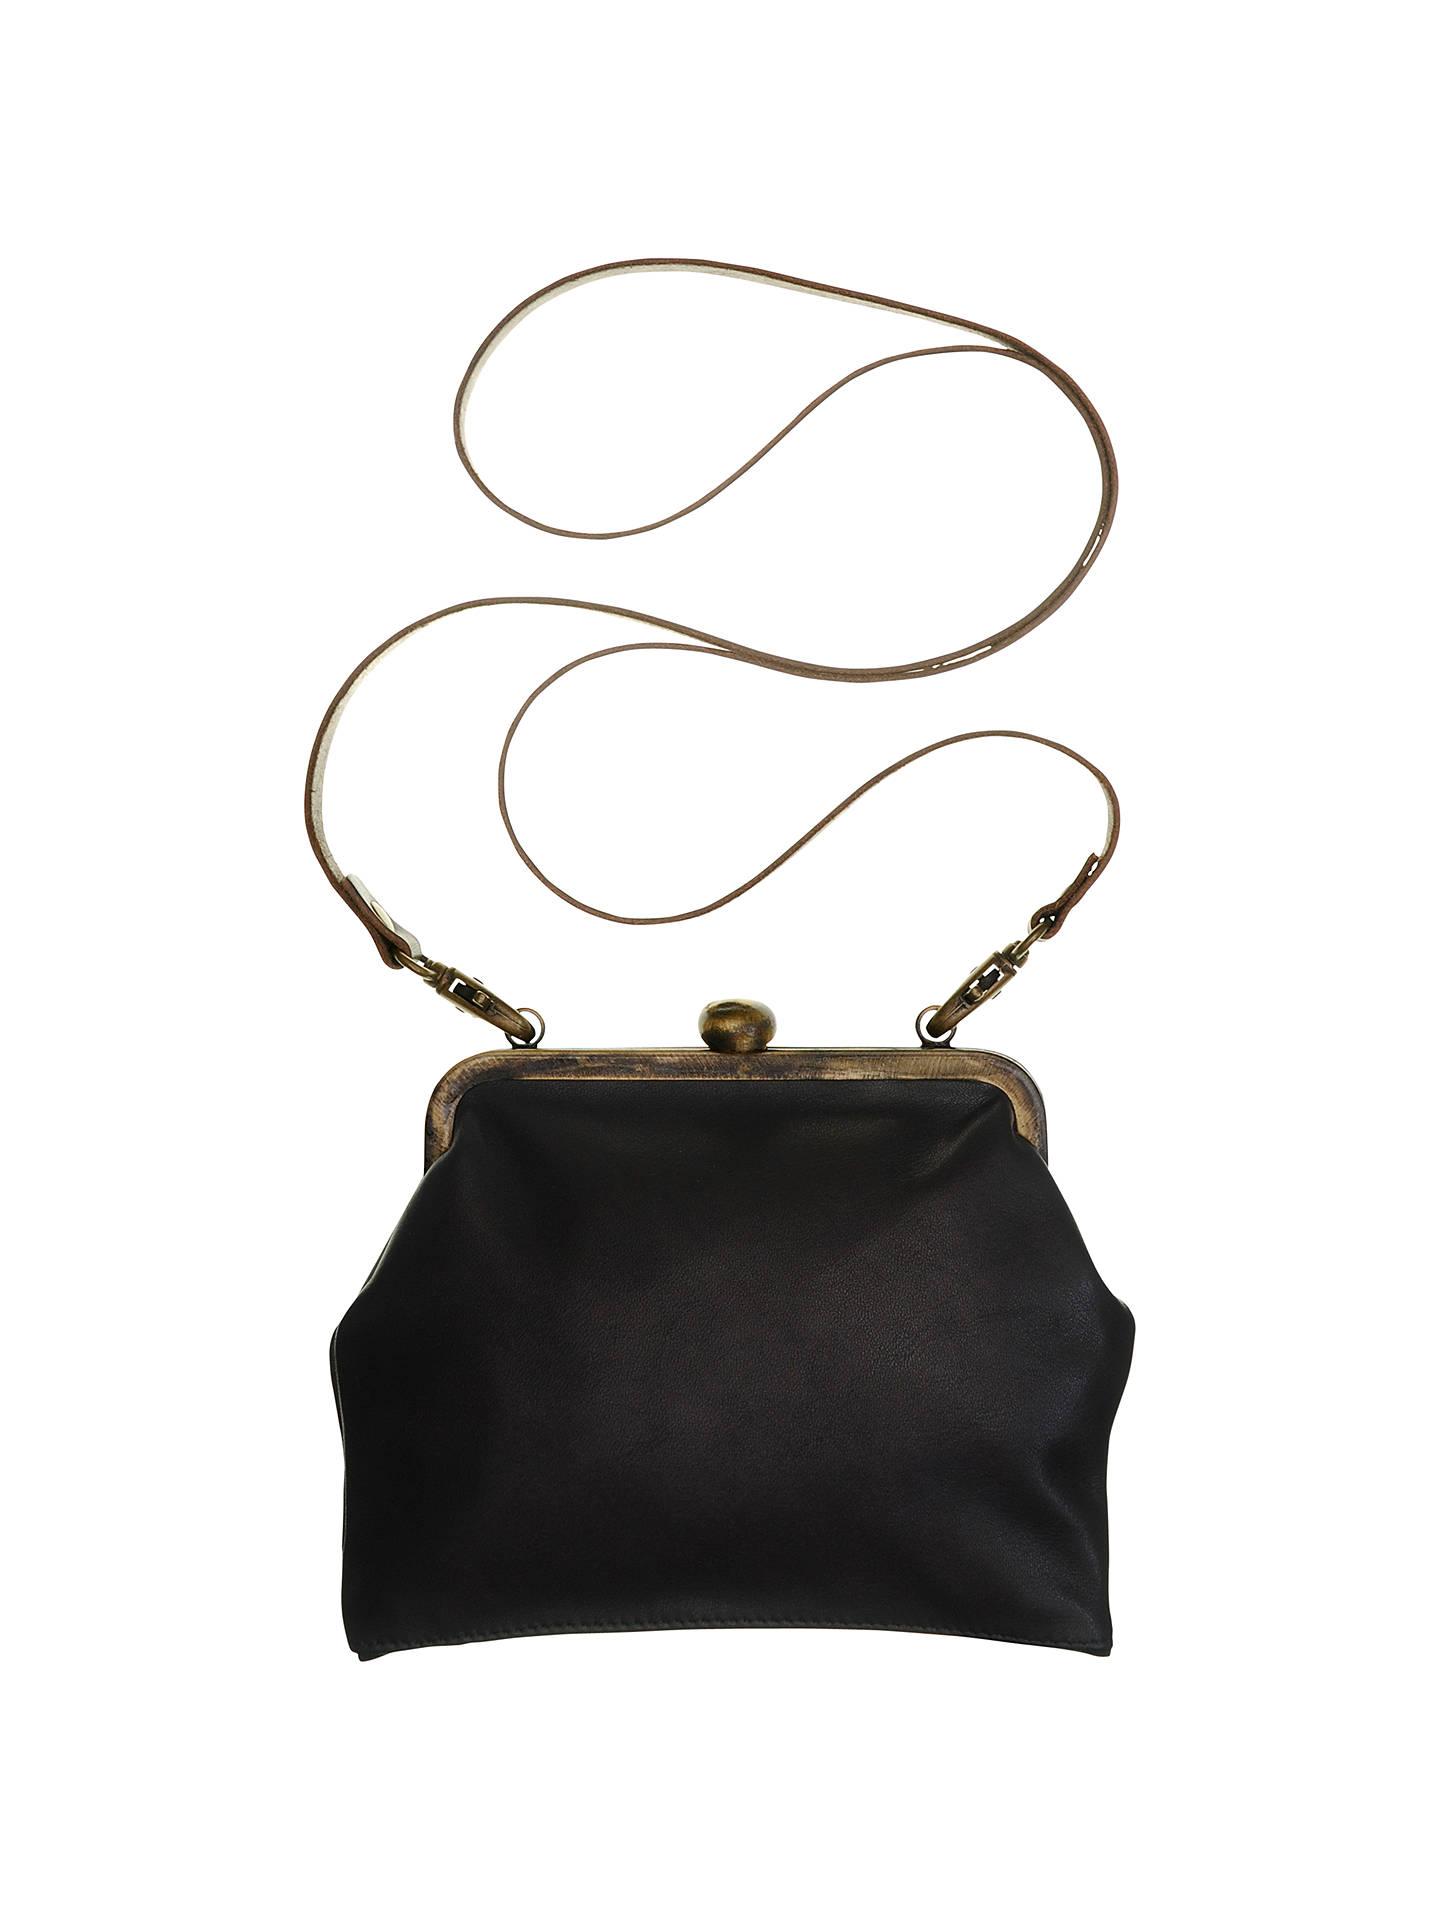 Mimi Berry Gracie Leather Frame Purse, Black at John Lewis & Partners